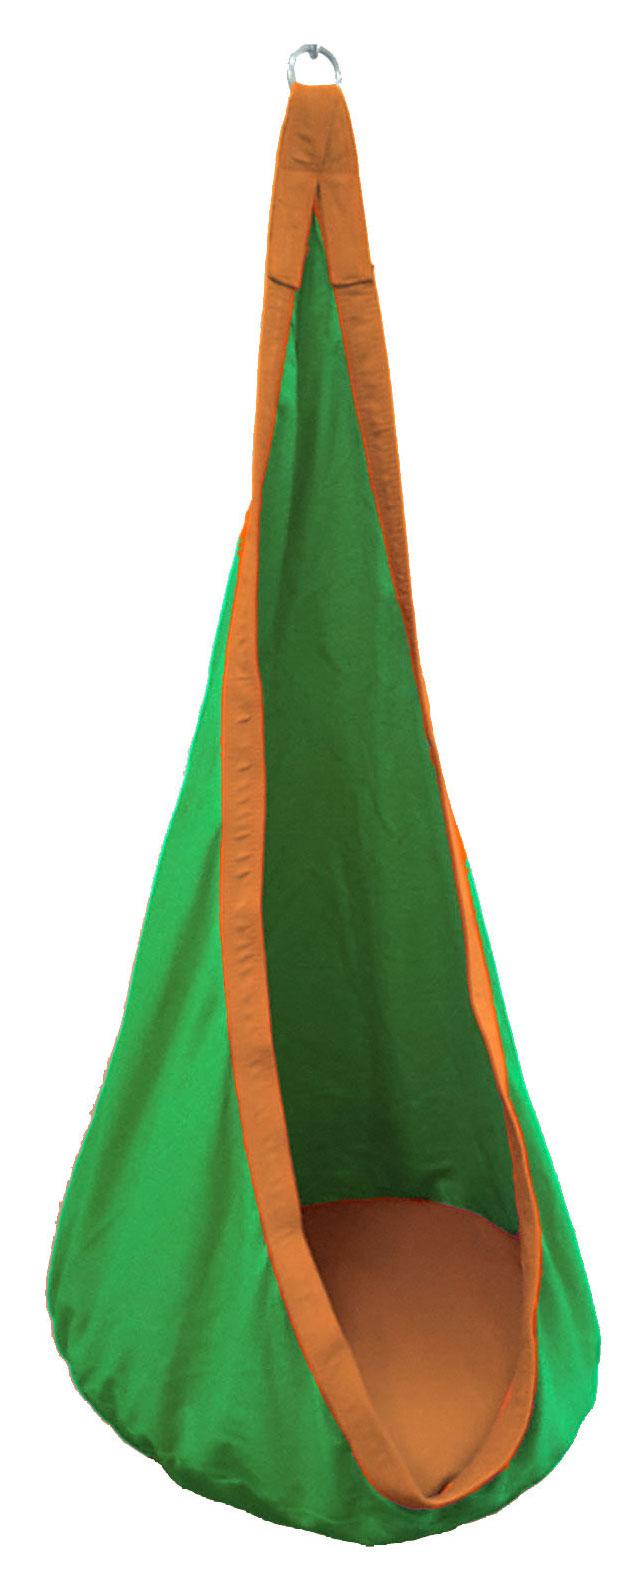 Green And Orange Waterproof Outdoor Sensory Swing Pod